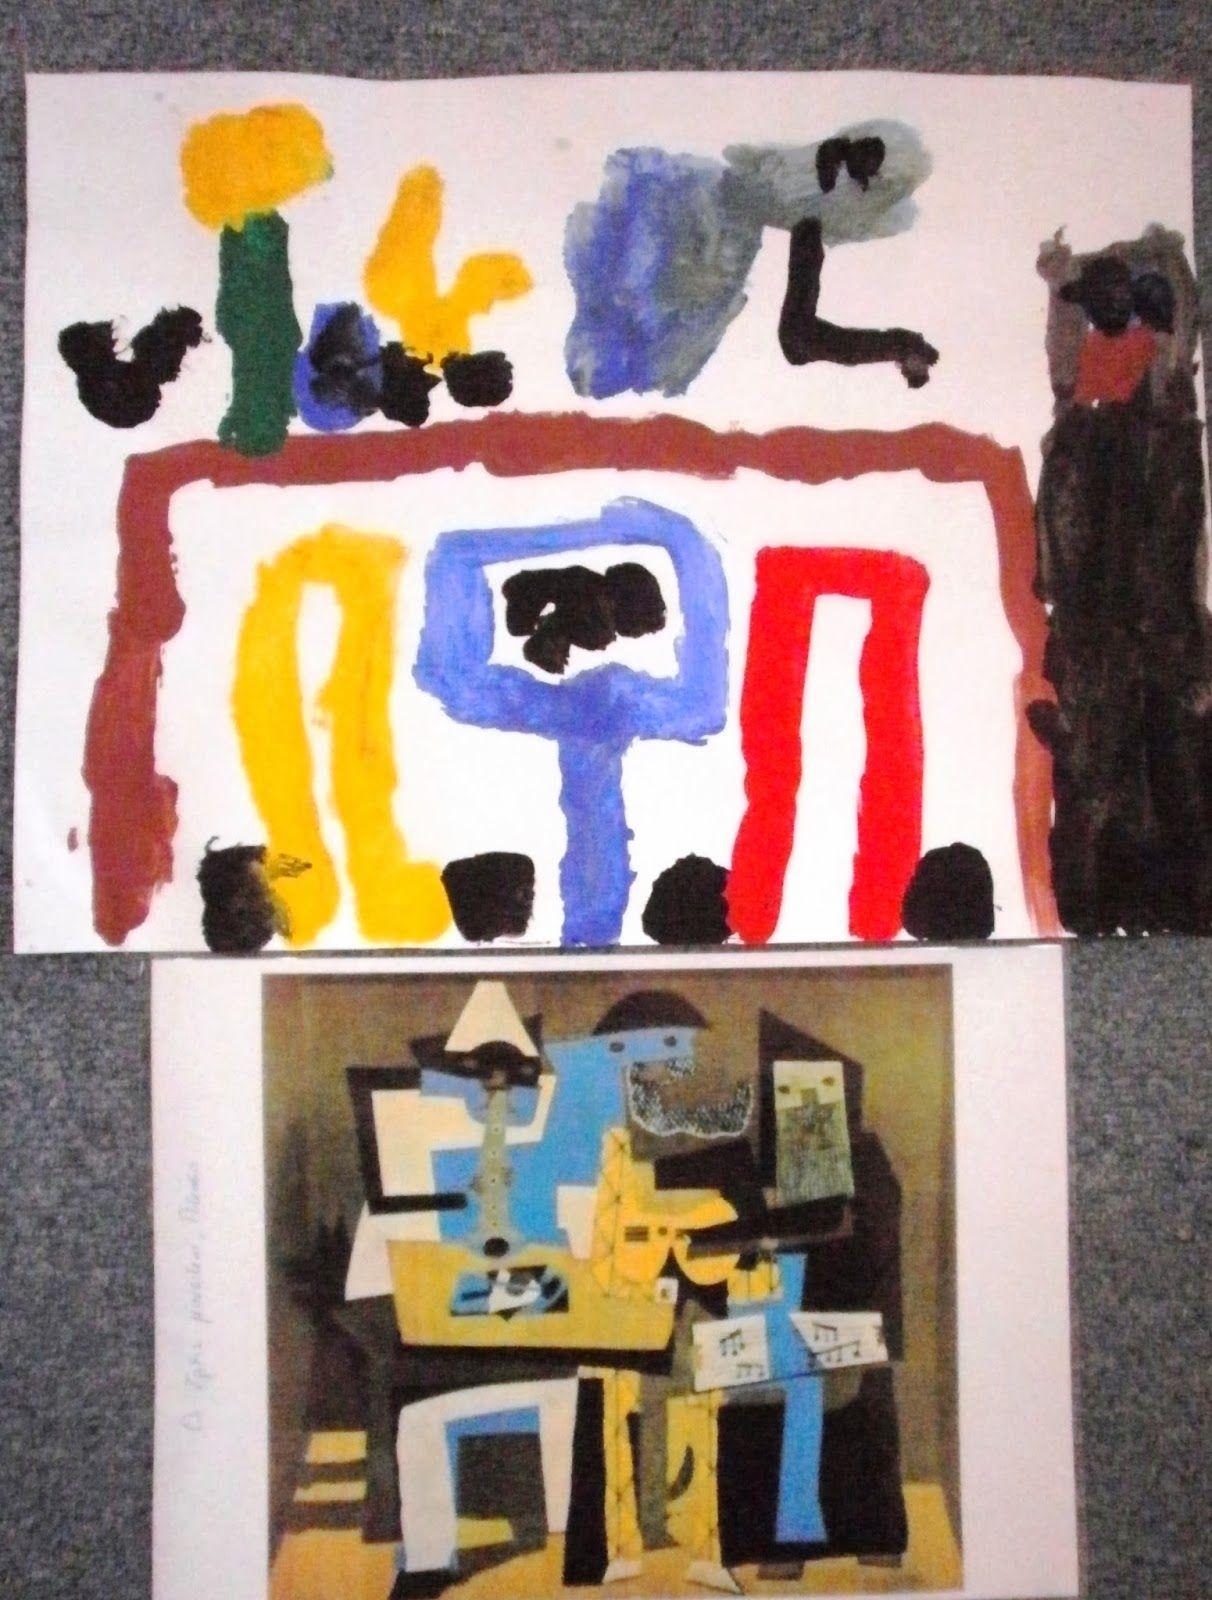 Sofia's Kindergarten